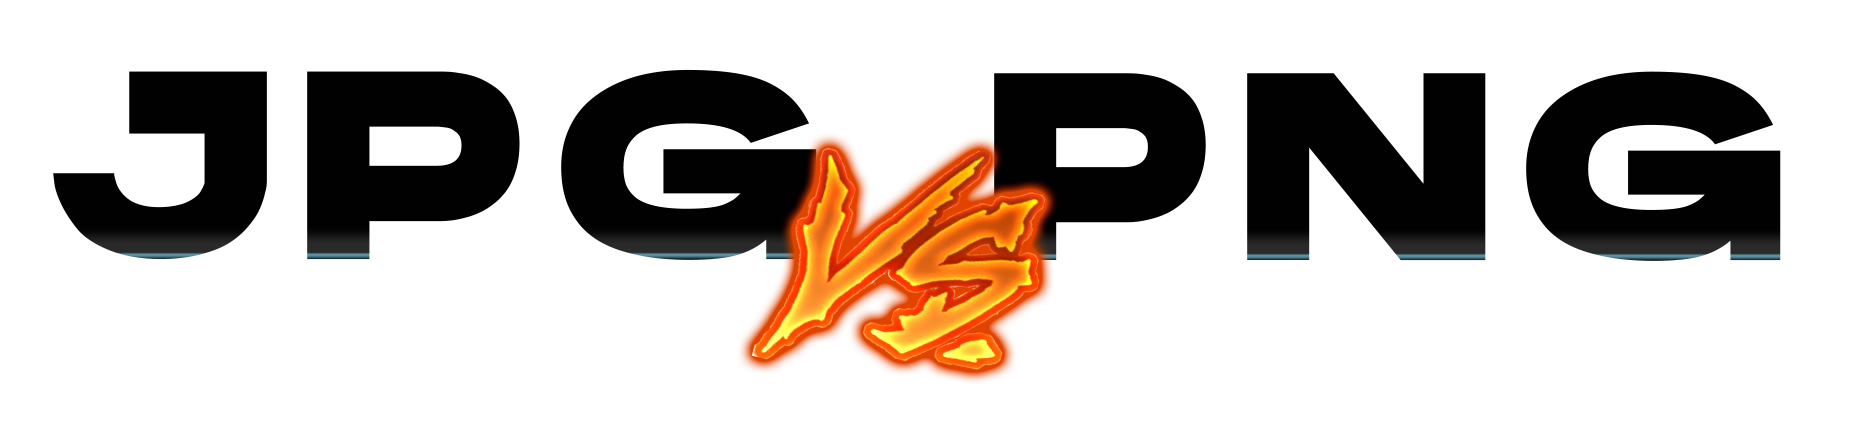 Jpg vs Png Piano Marketing Granada